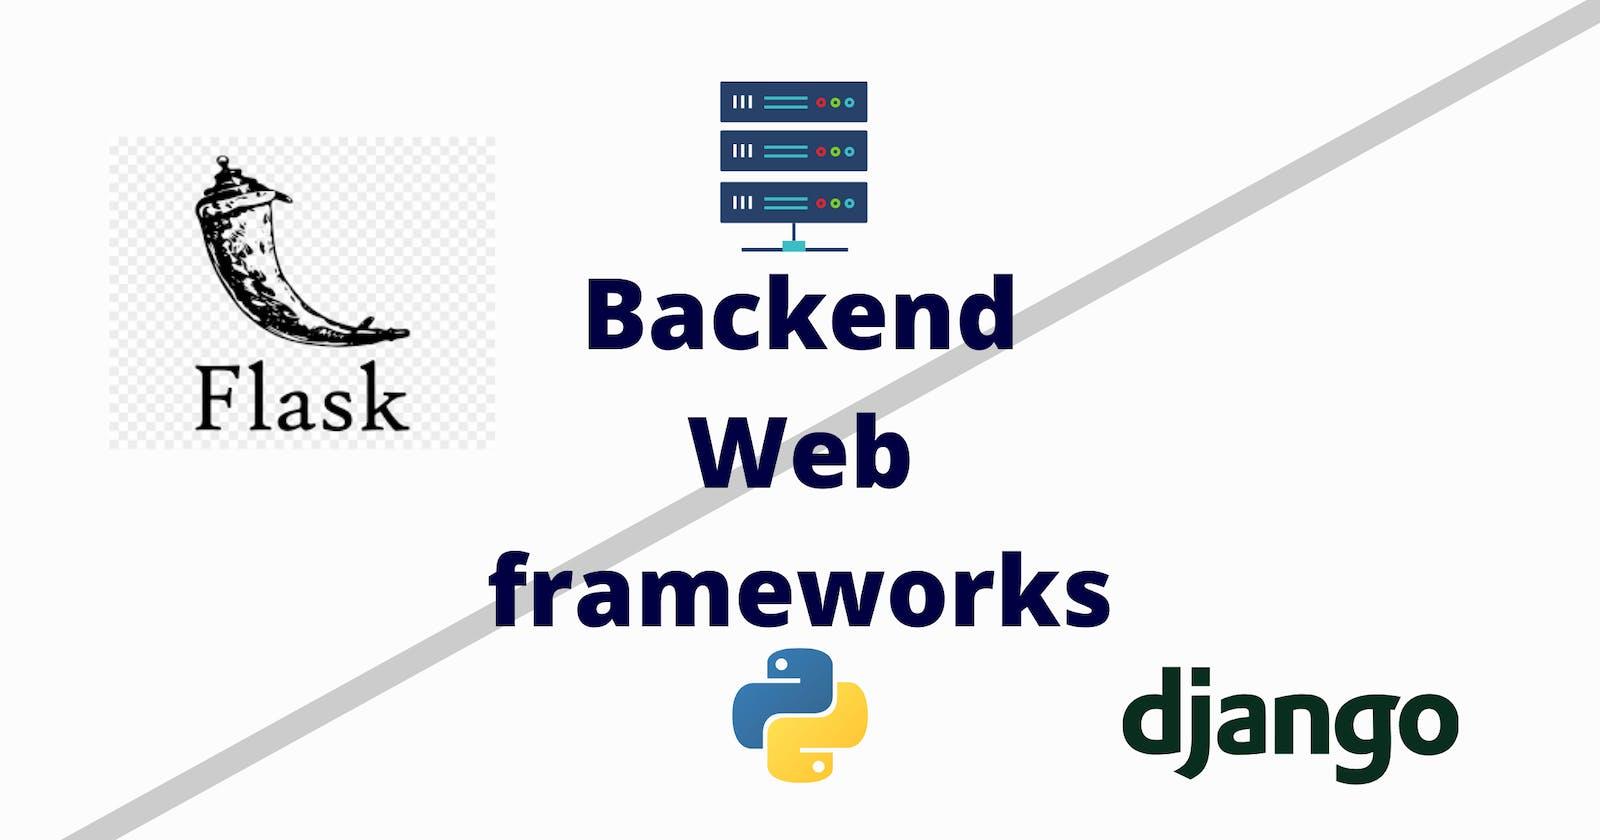 Understanding backend Web Frameworks like Django and Flask